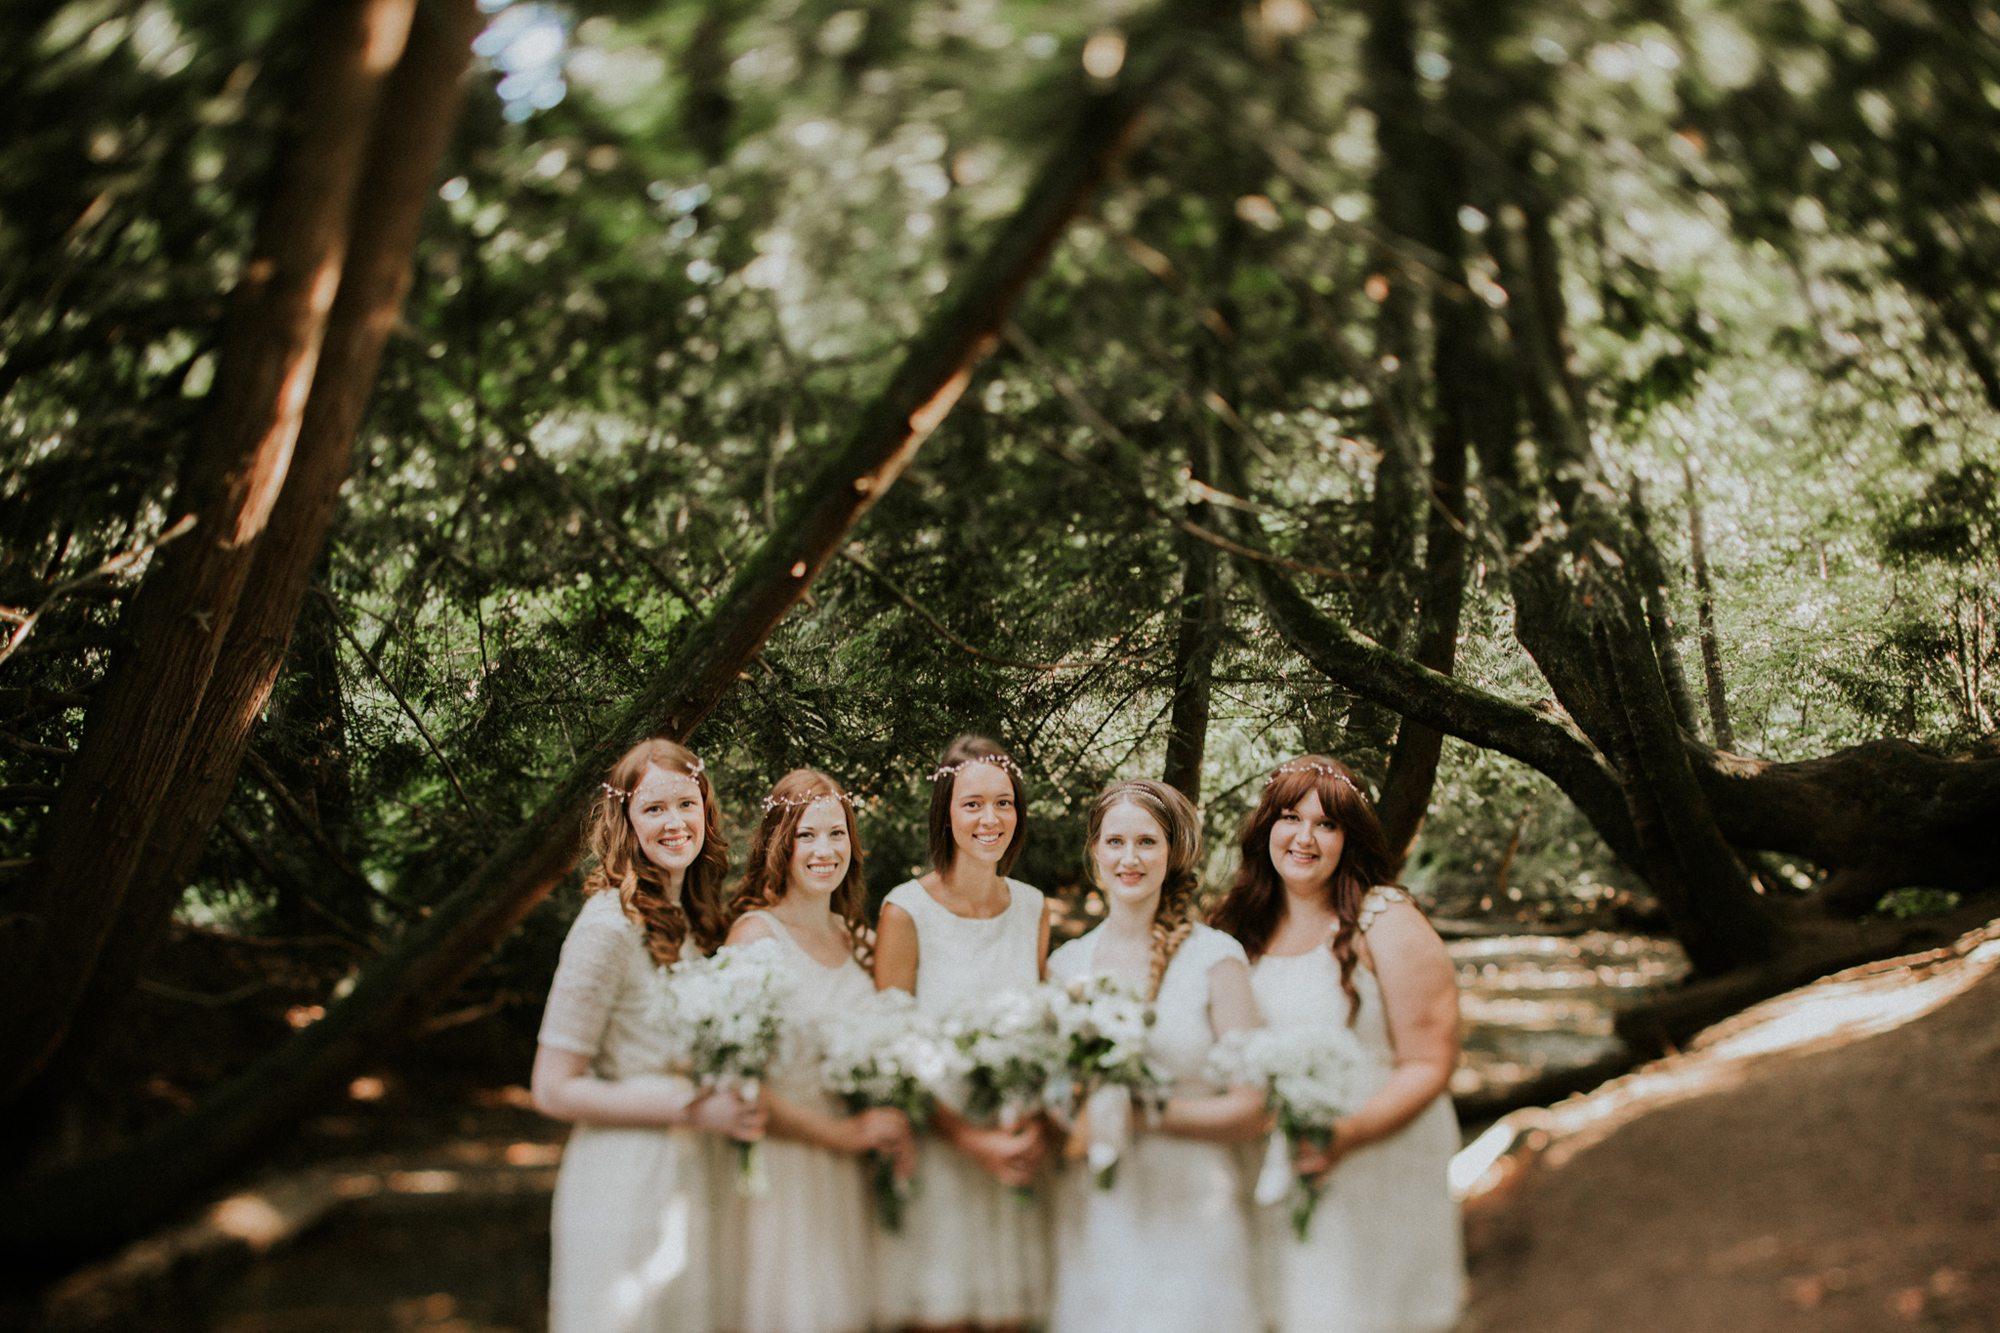 855-abbotsford-wedding-photographer